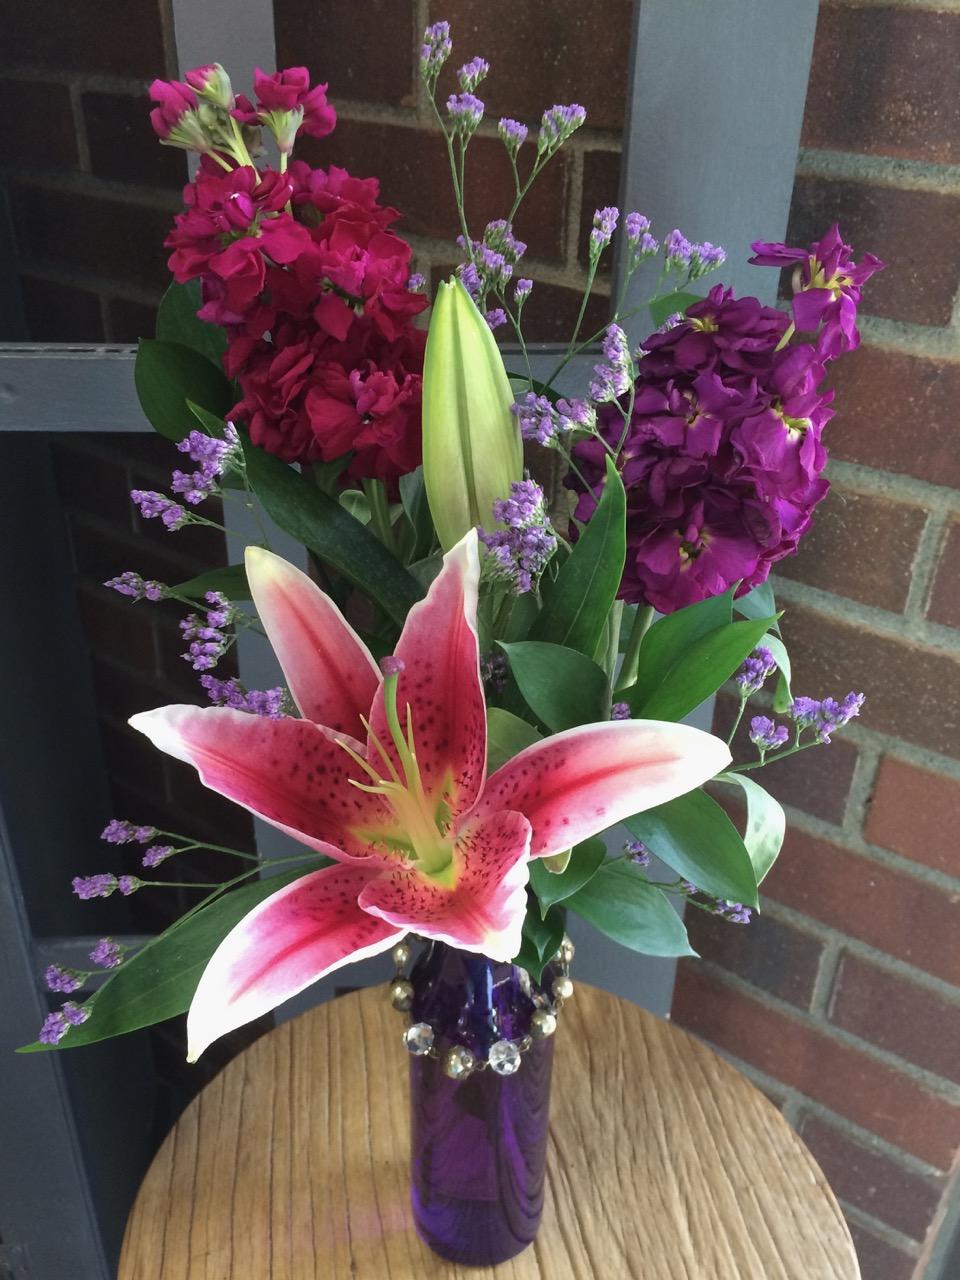 reba_laborday_flowers_spiritedtable_photo1.jpg